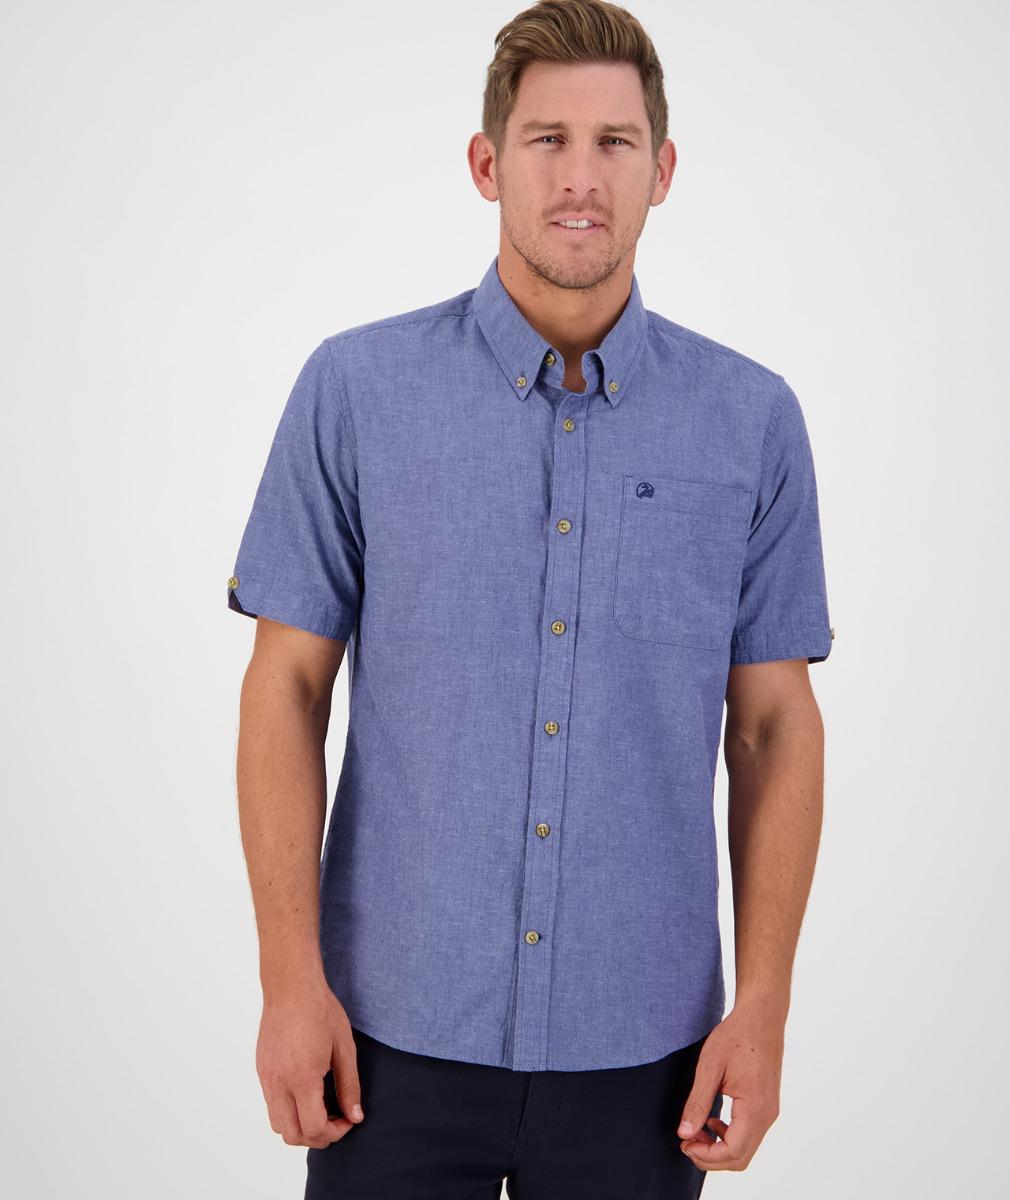 Swanndri Men's Lowell Short Sleeve Shirt in Blue